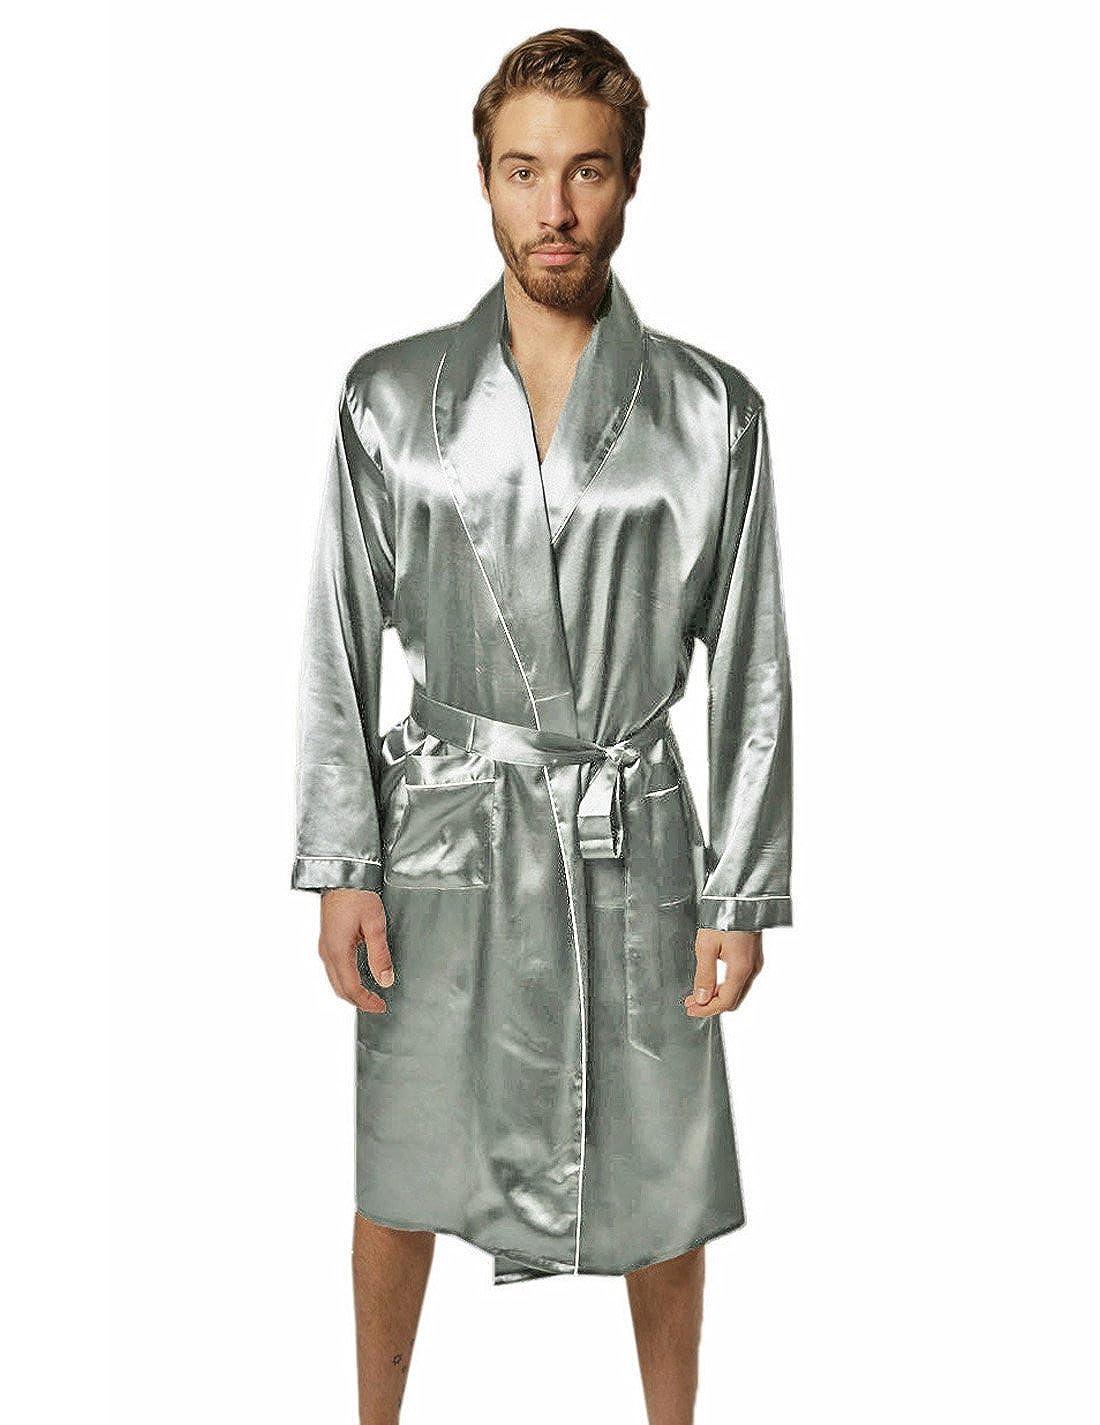 Silk moda mens premium long lounge pajama robe bathrobe light weight summer  silver at amazon mens 72c4fca8c